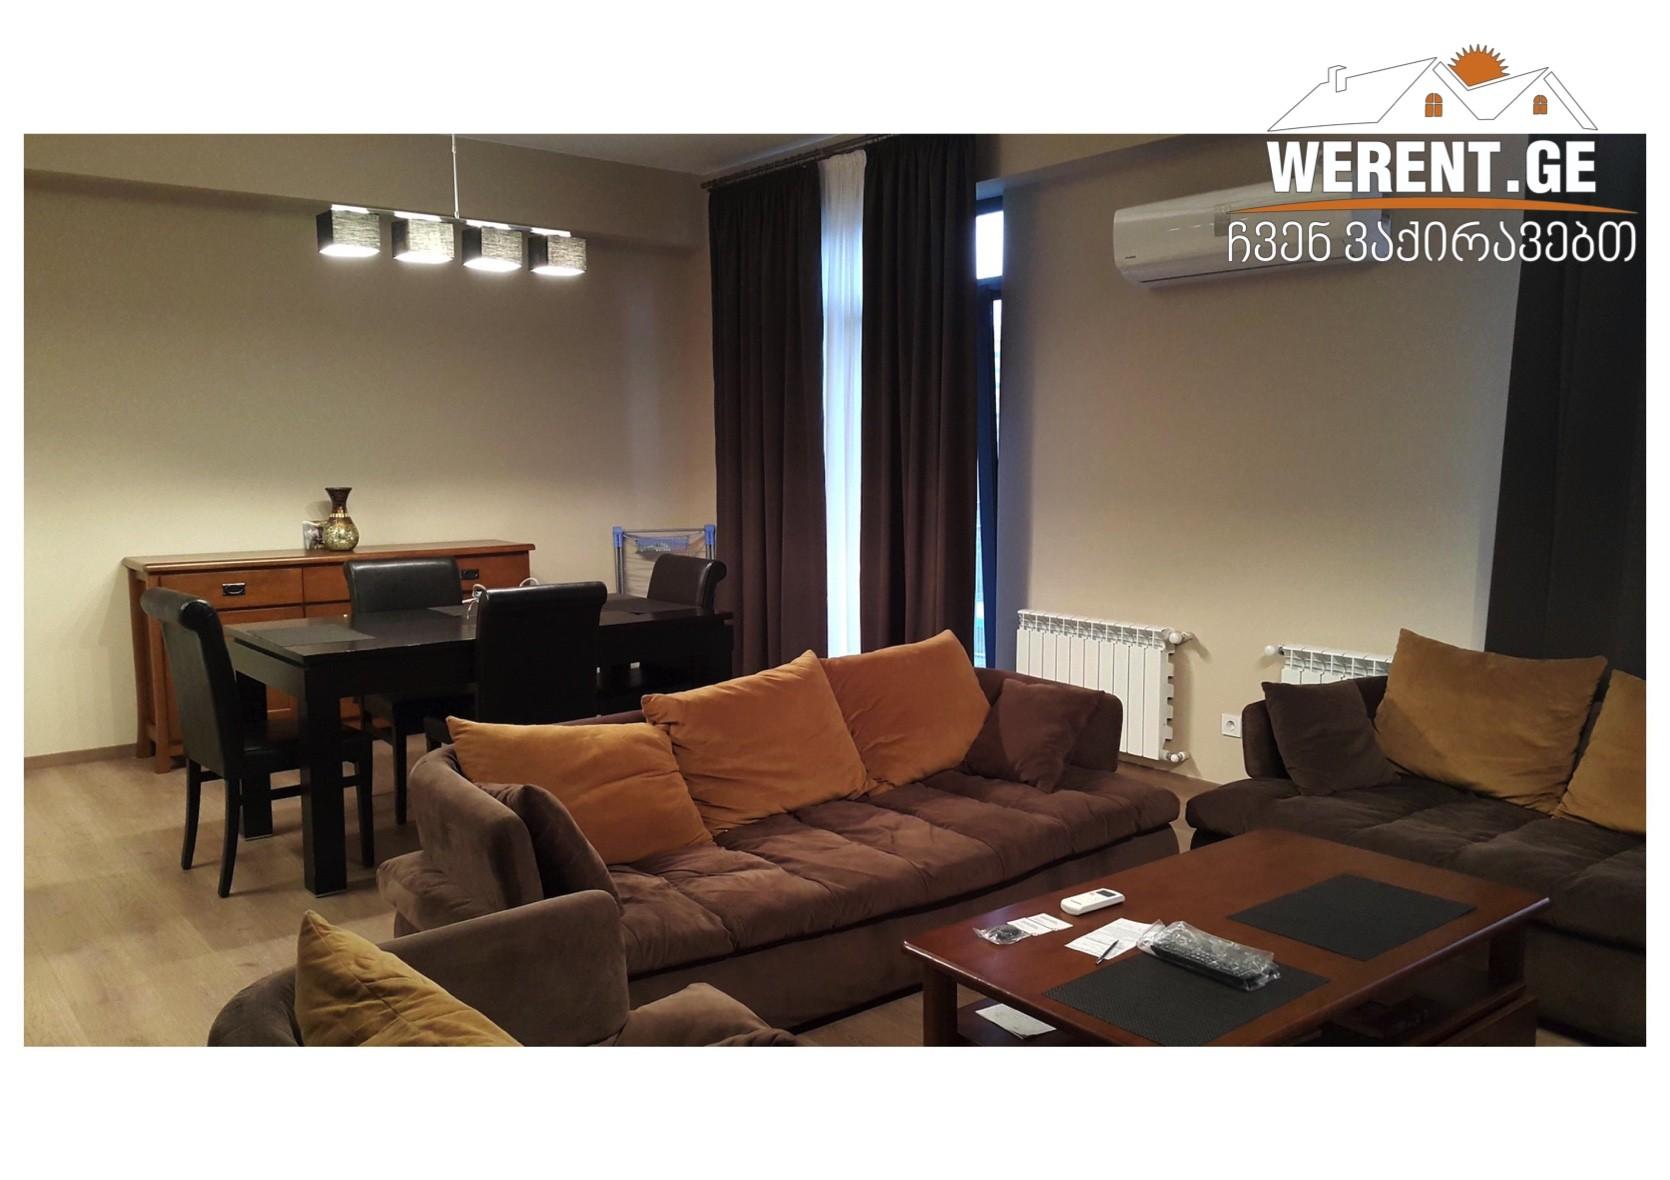 3 Room Big Apartment For Rent At M2 Kazbegi, Saburtalo, Tbilisi